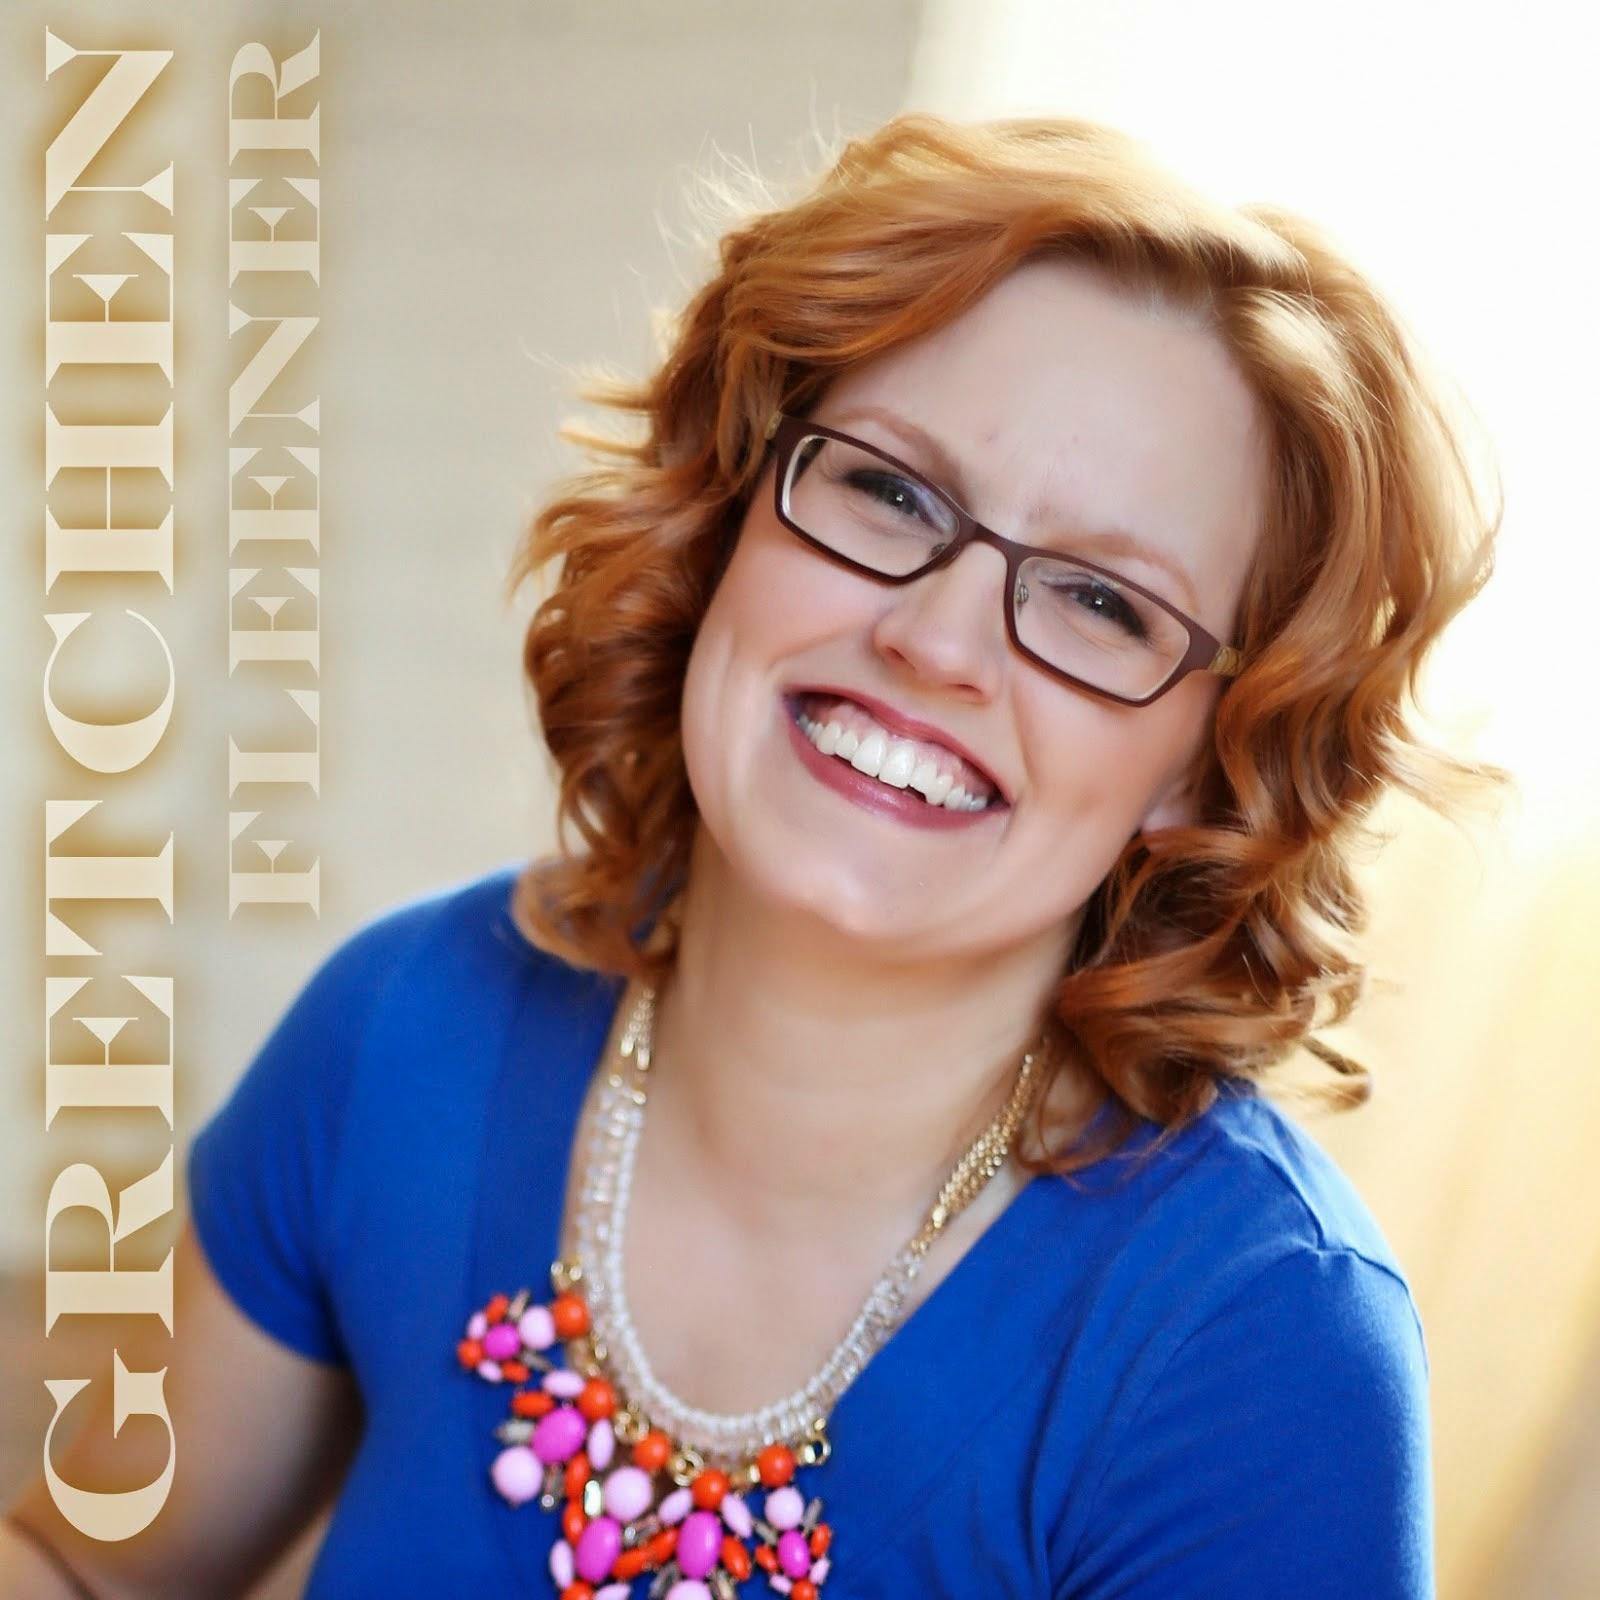 Gretchen Fleener